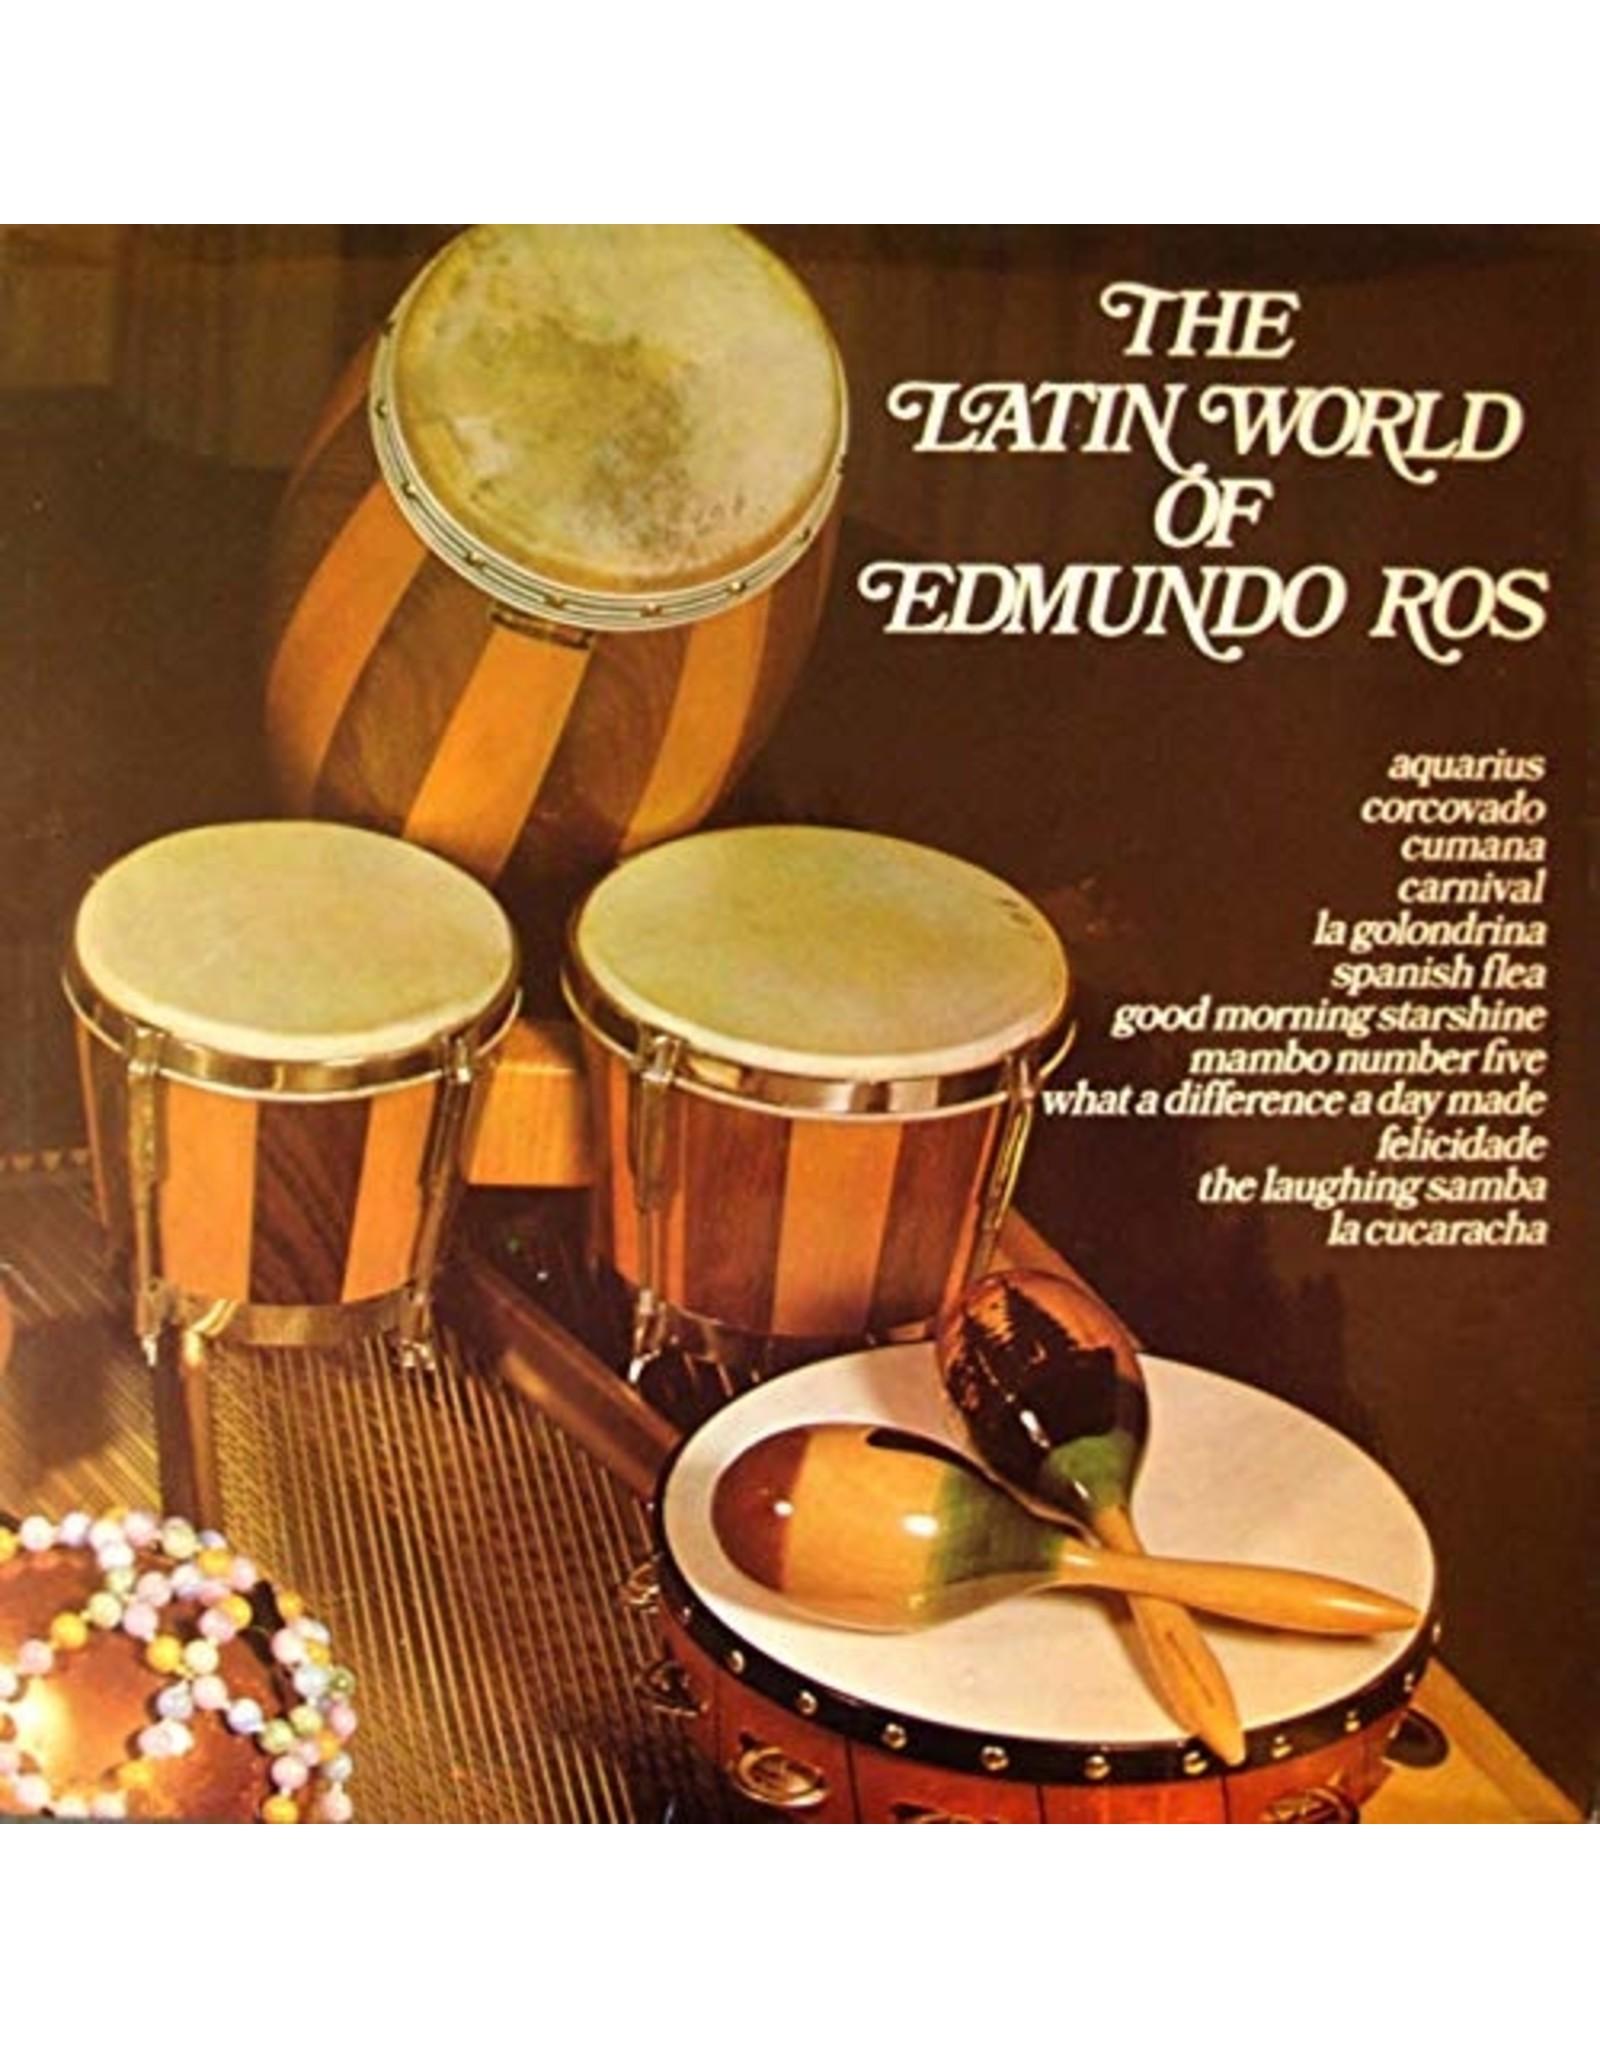 New Vinyl Edmundo Ros - The Latin World Of Edmundo Ros LP